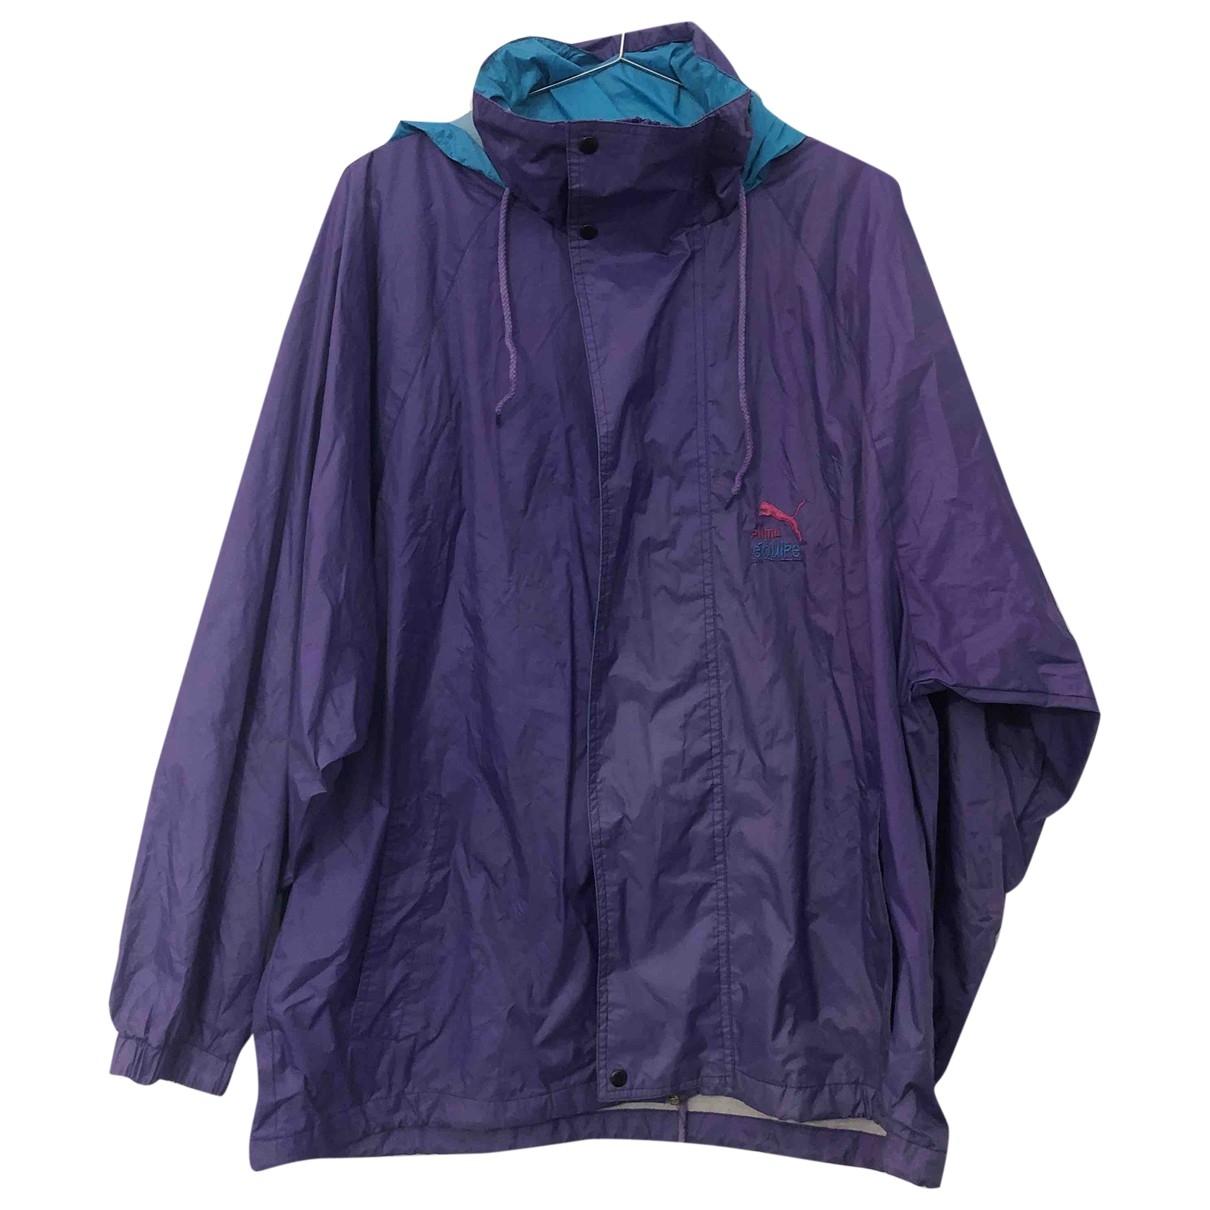 Puma \N Purple coat  for Men M International